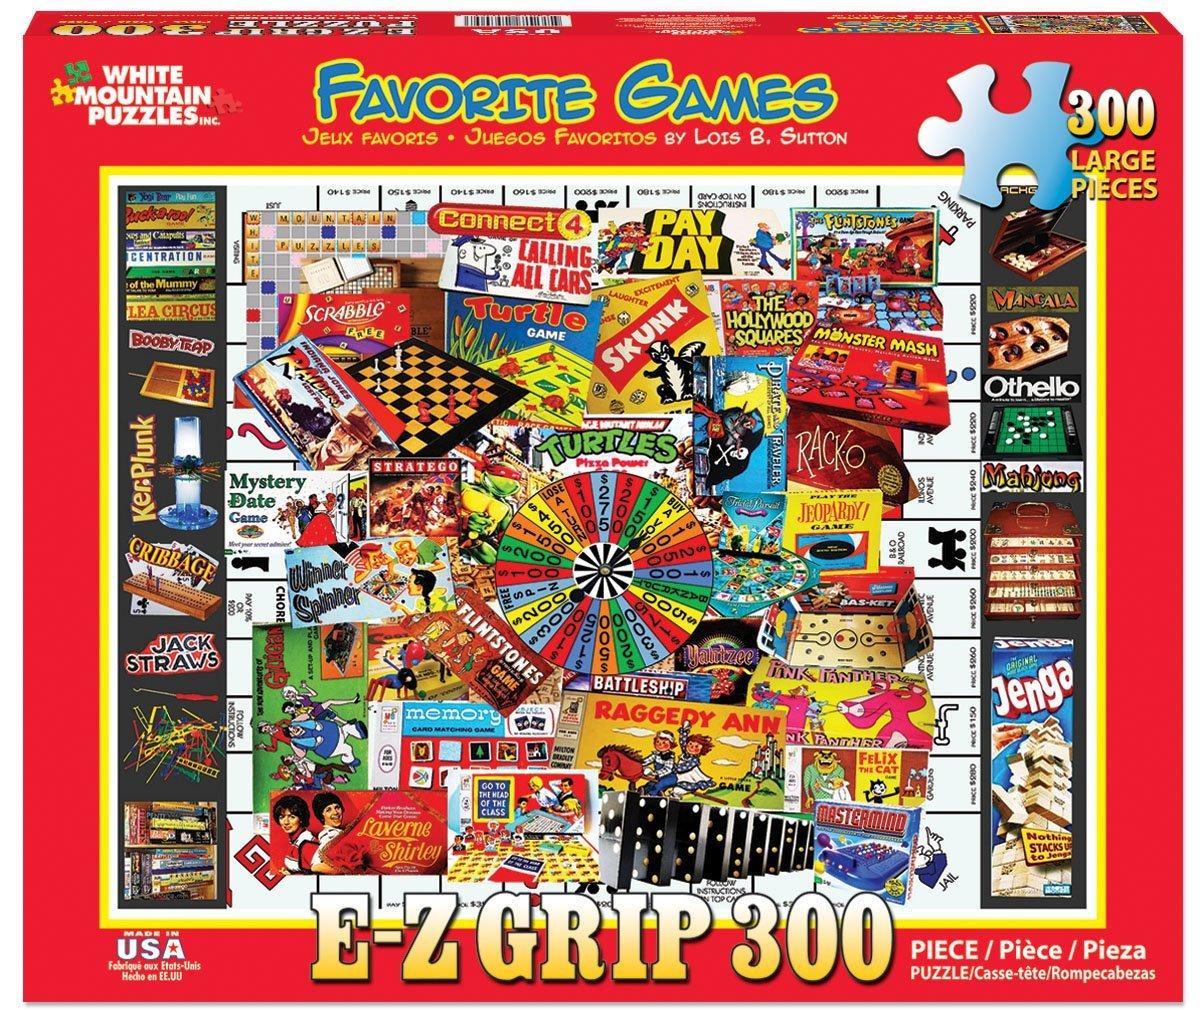 Puzzles Games: White Mountain Puzzles Favorite Games 300 Piece Jigsaw EZ